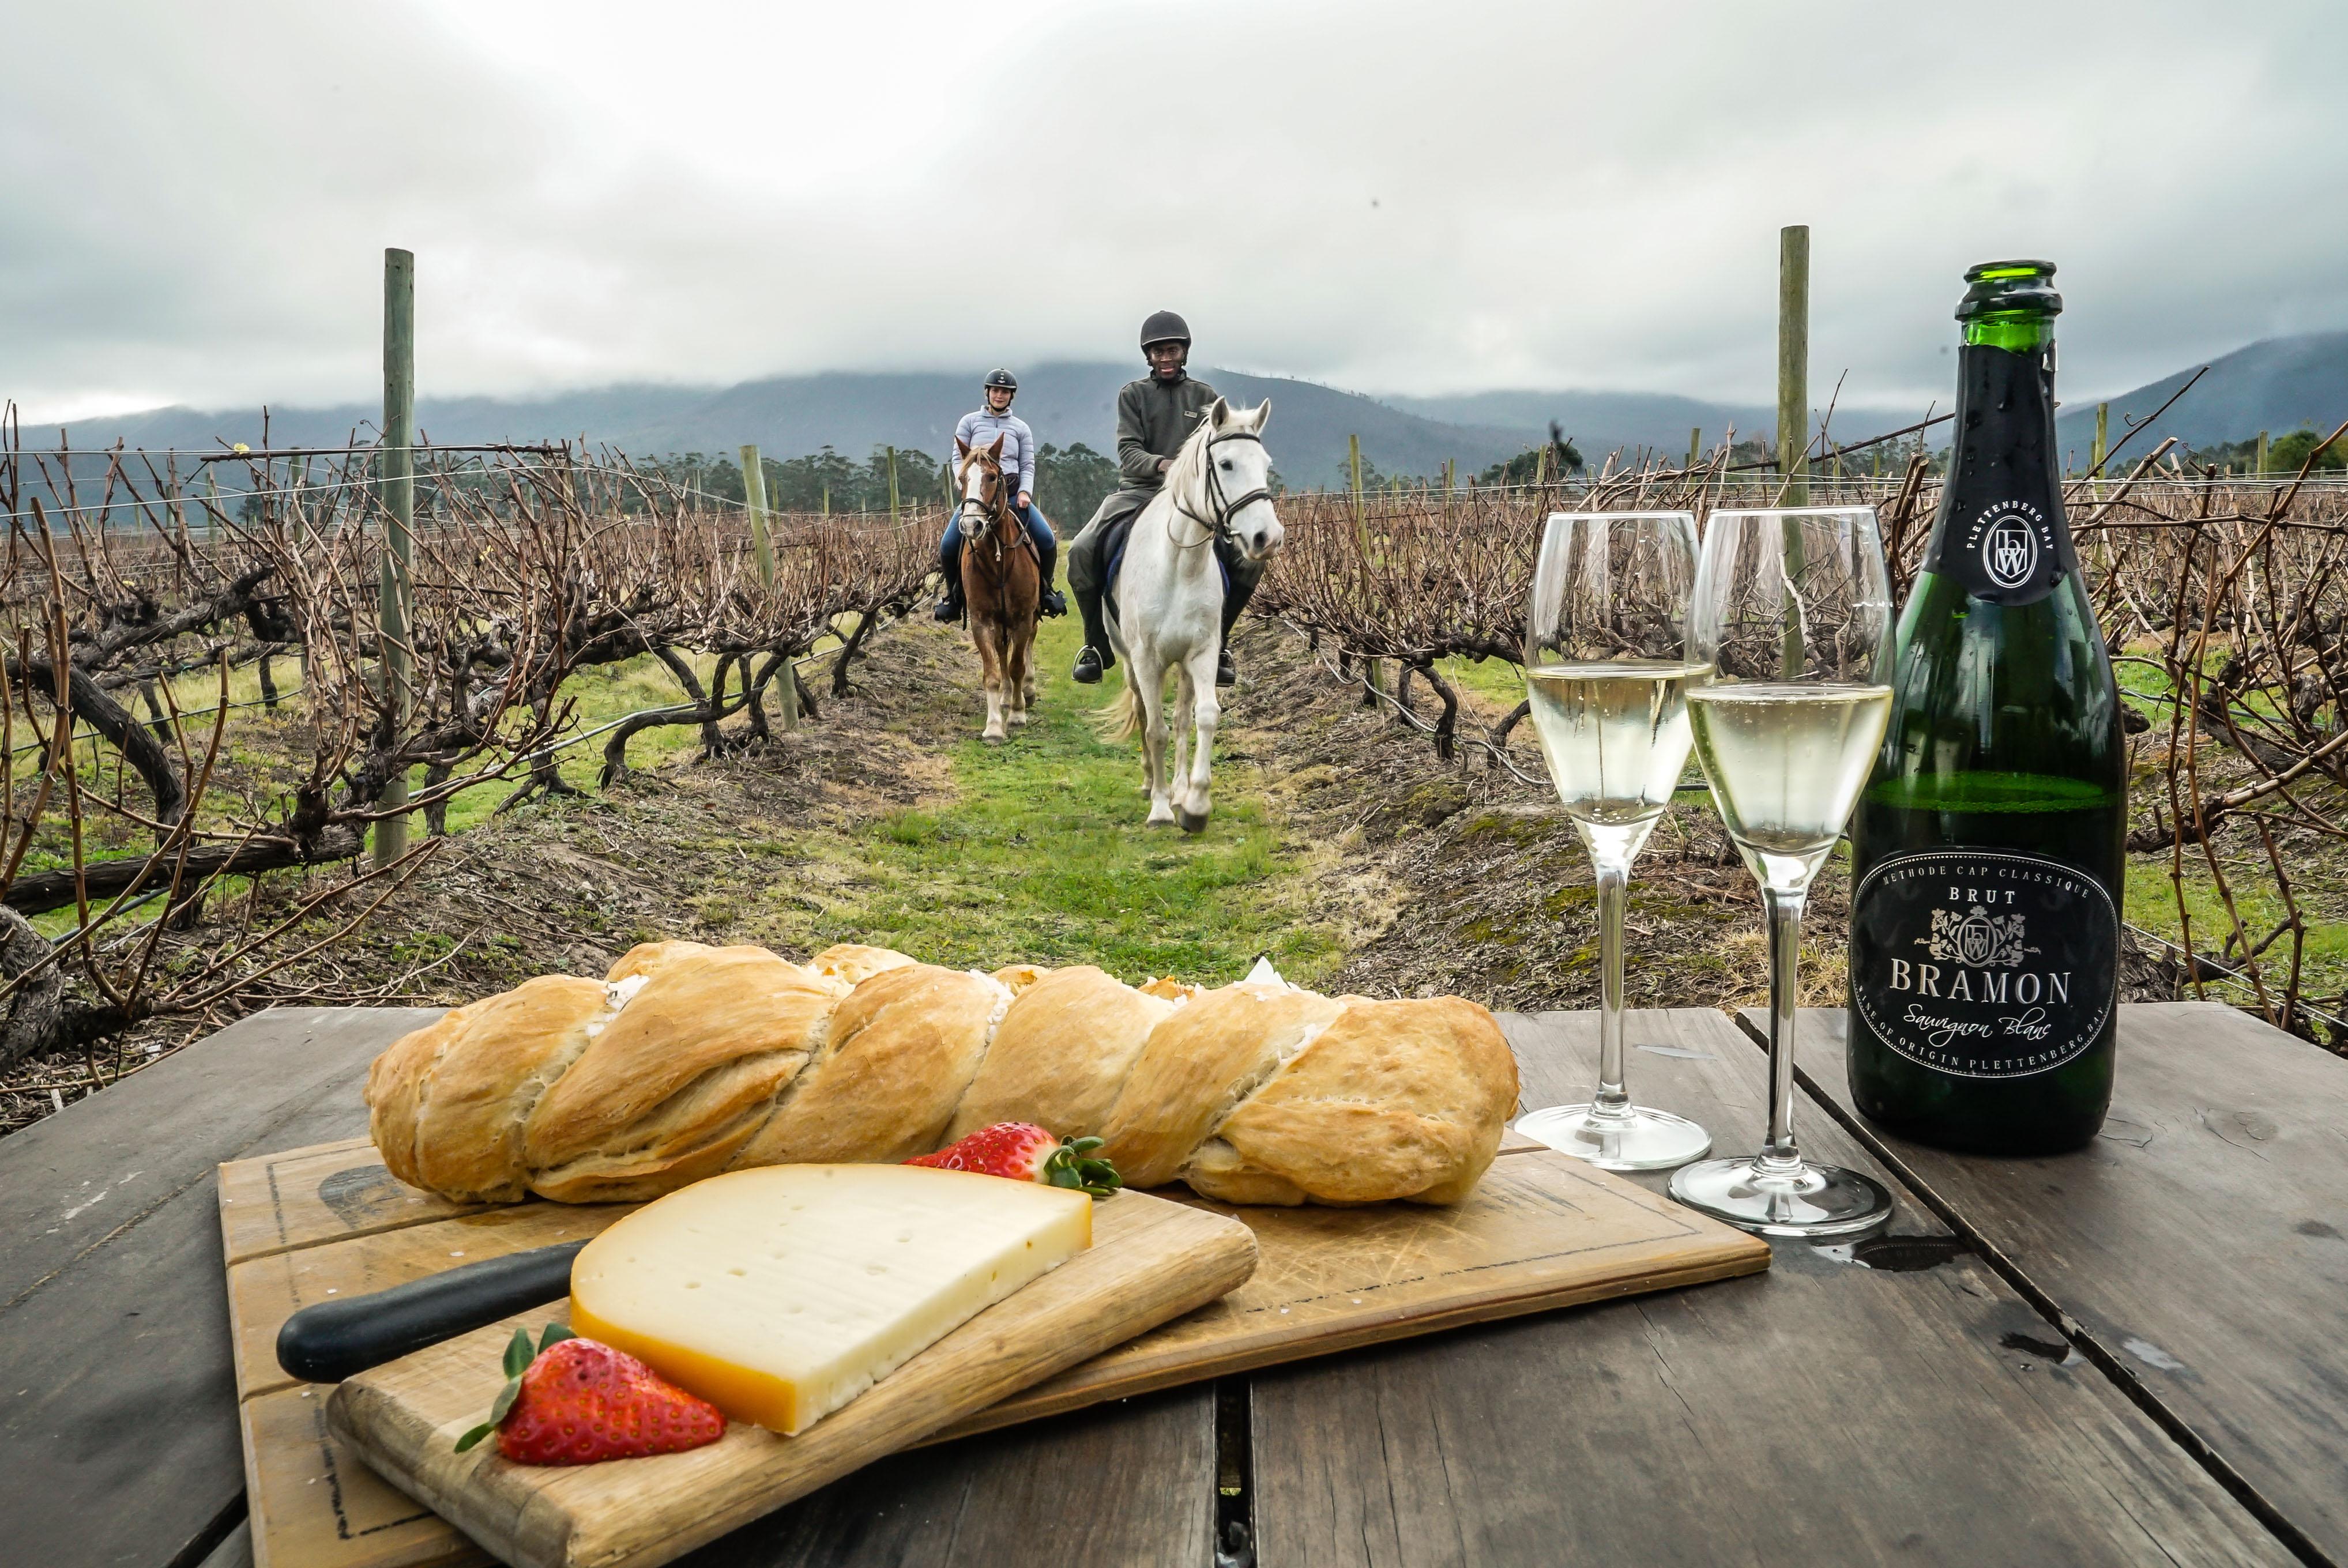 https://www.sirplett.co.za/userfiles/images/Hog-Hollow-Horse-Trails-Wine-Trail.jpg